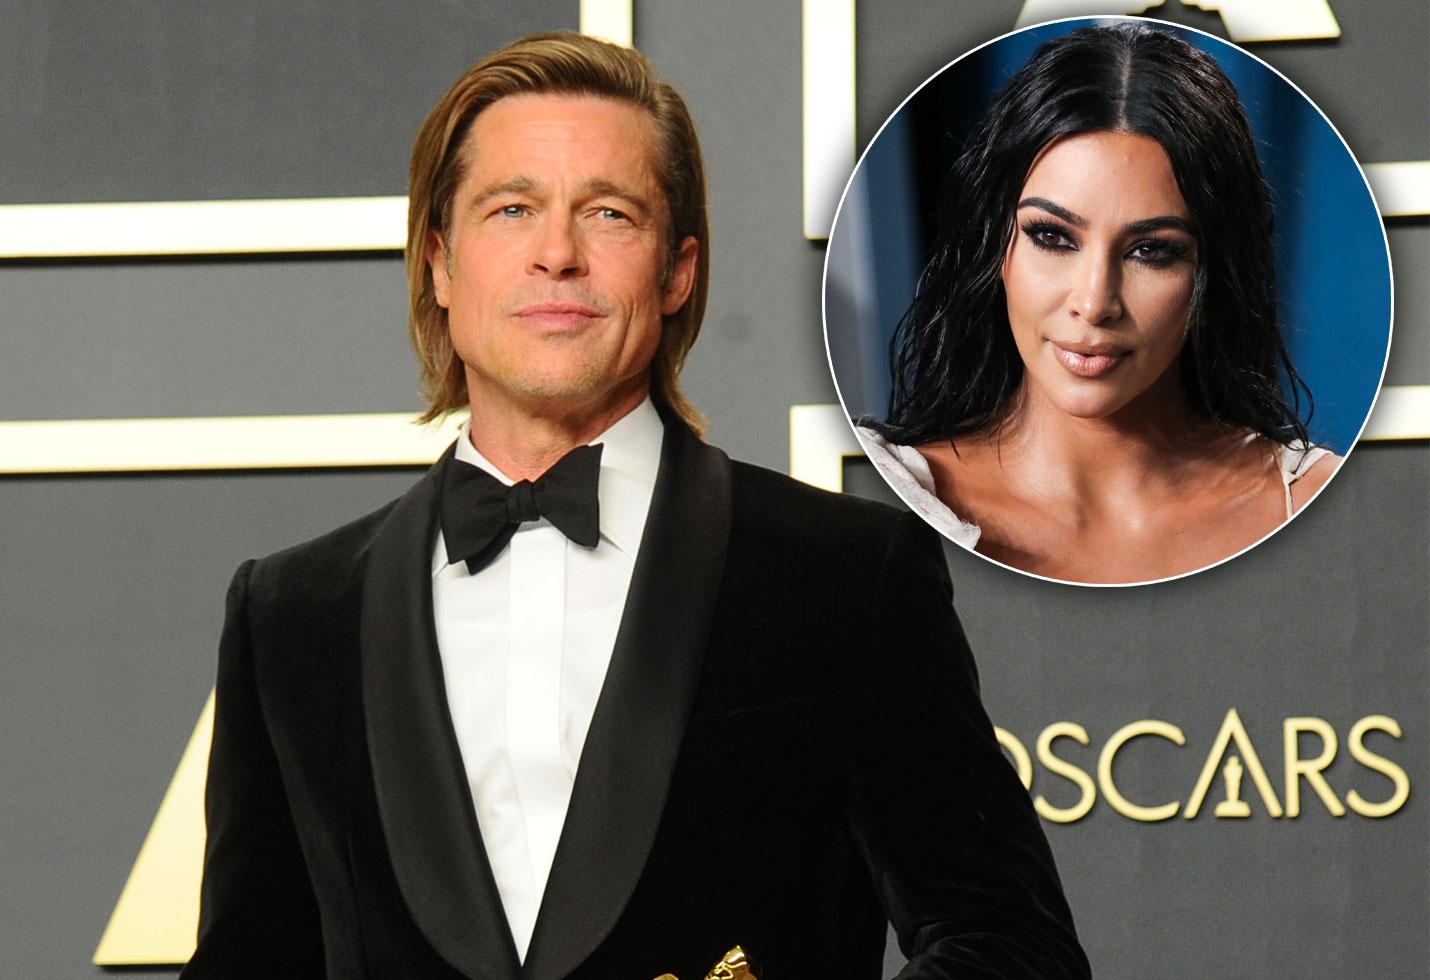 Brad Pitt and Kim Kardashian